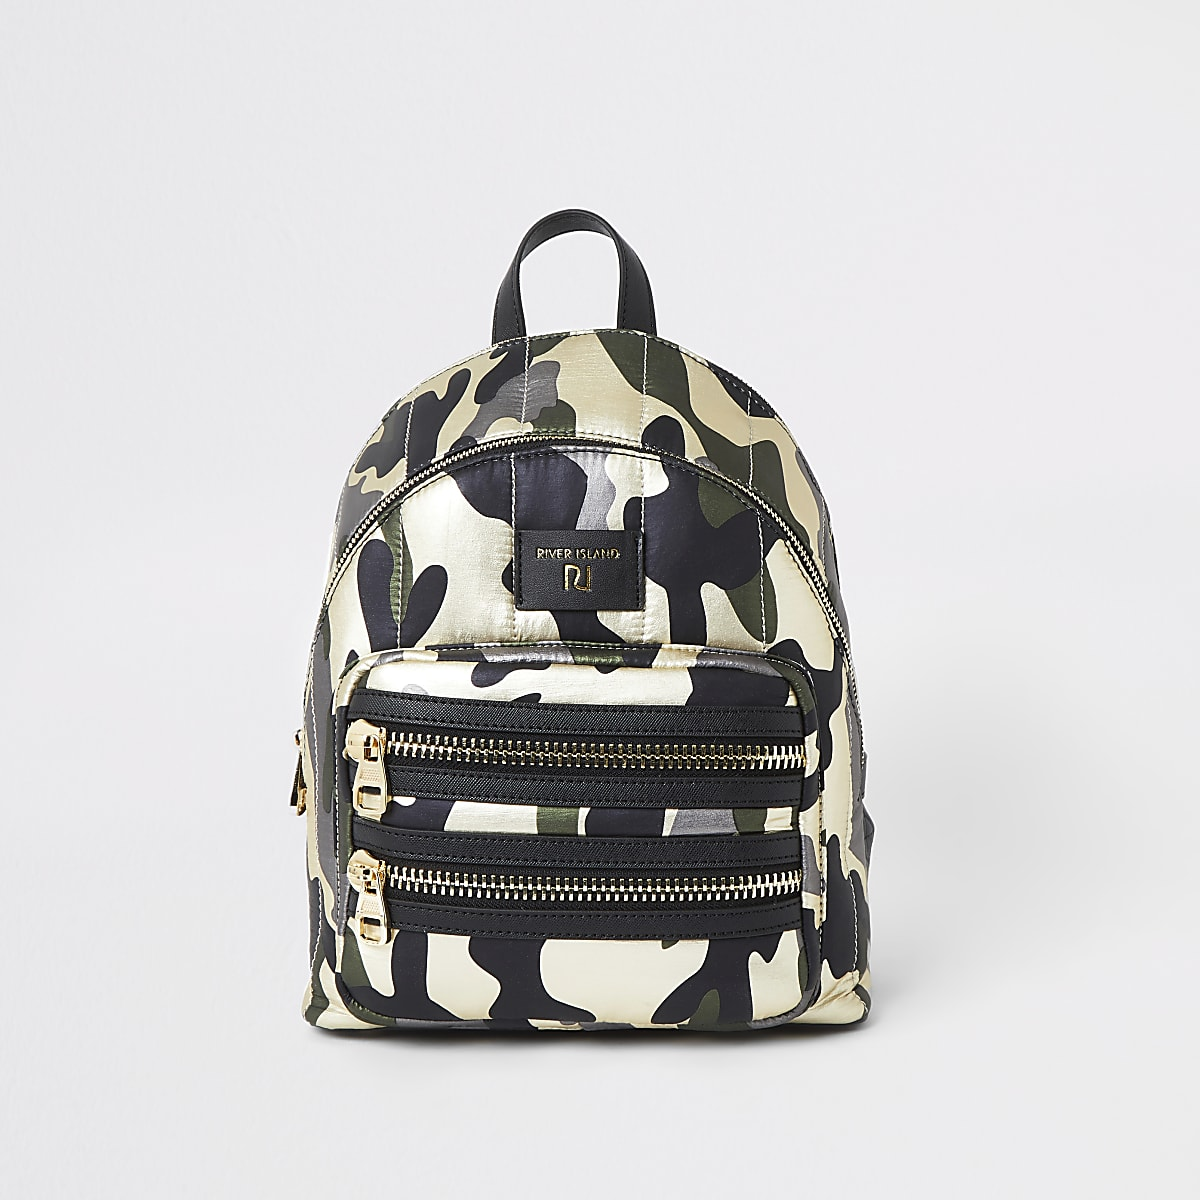 Dark green camo print backpack